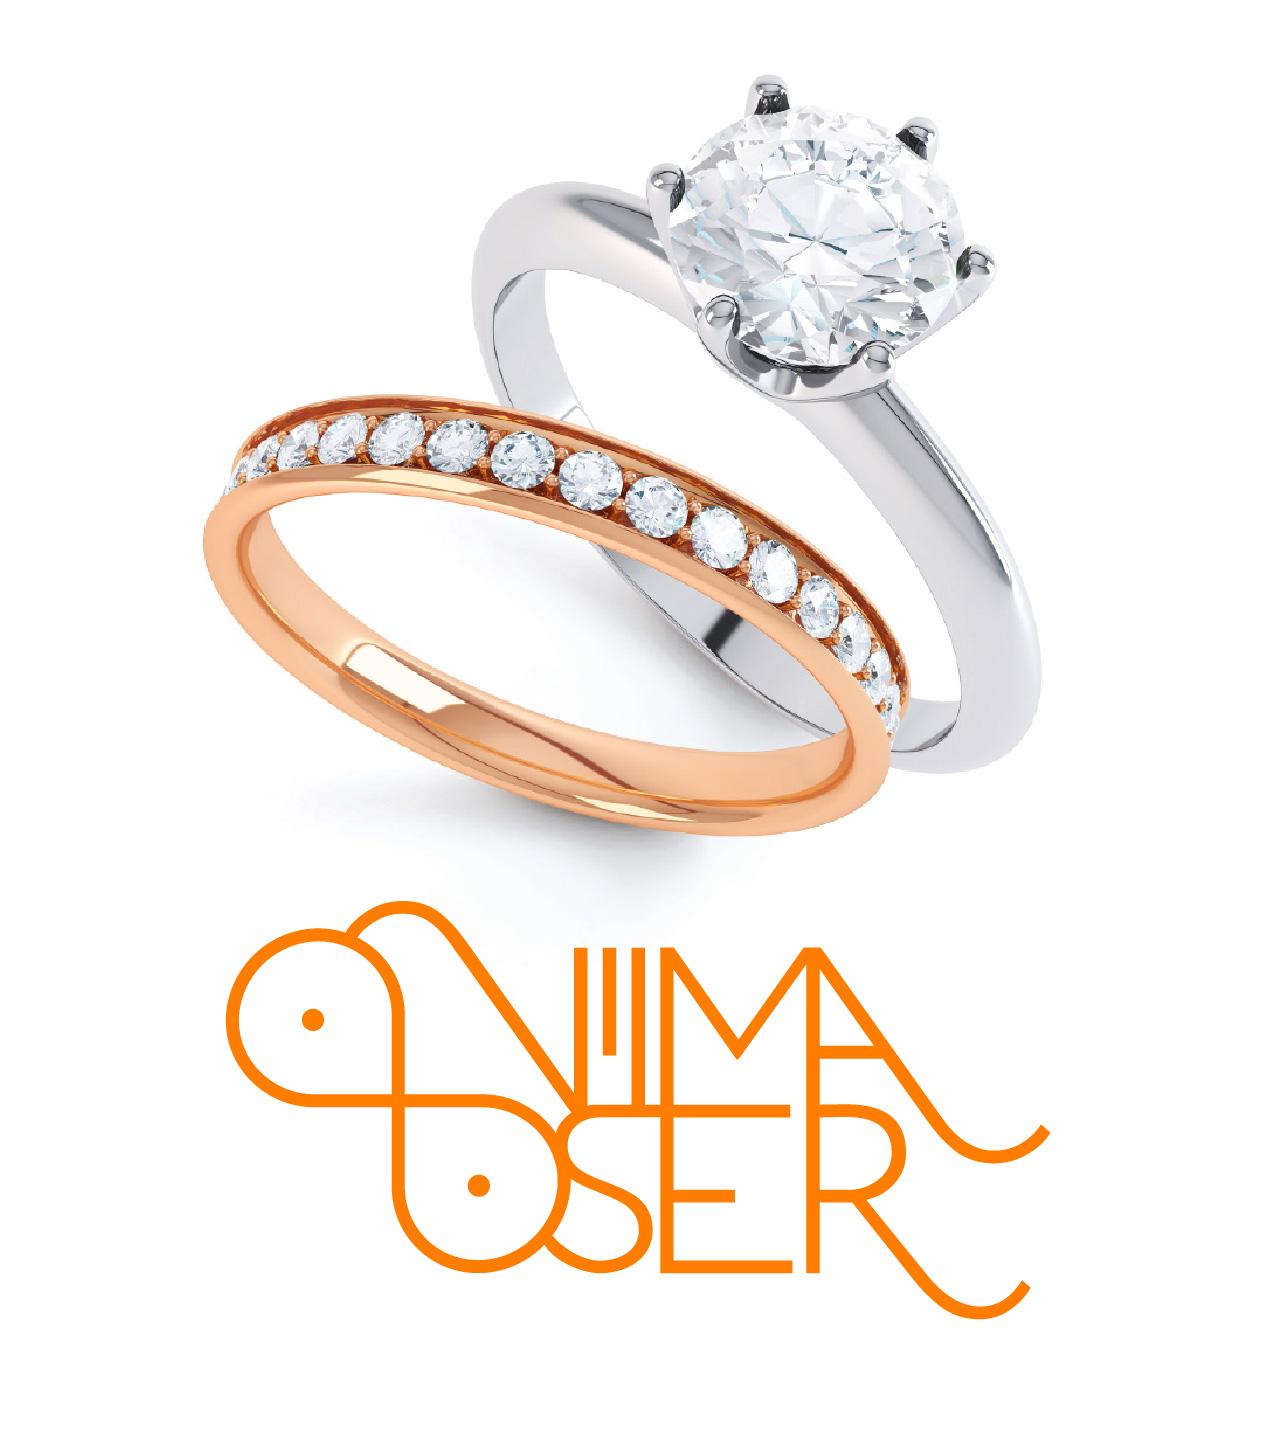 Vilma Ser Branding 7 / Logobou design